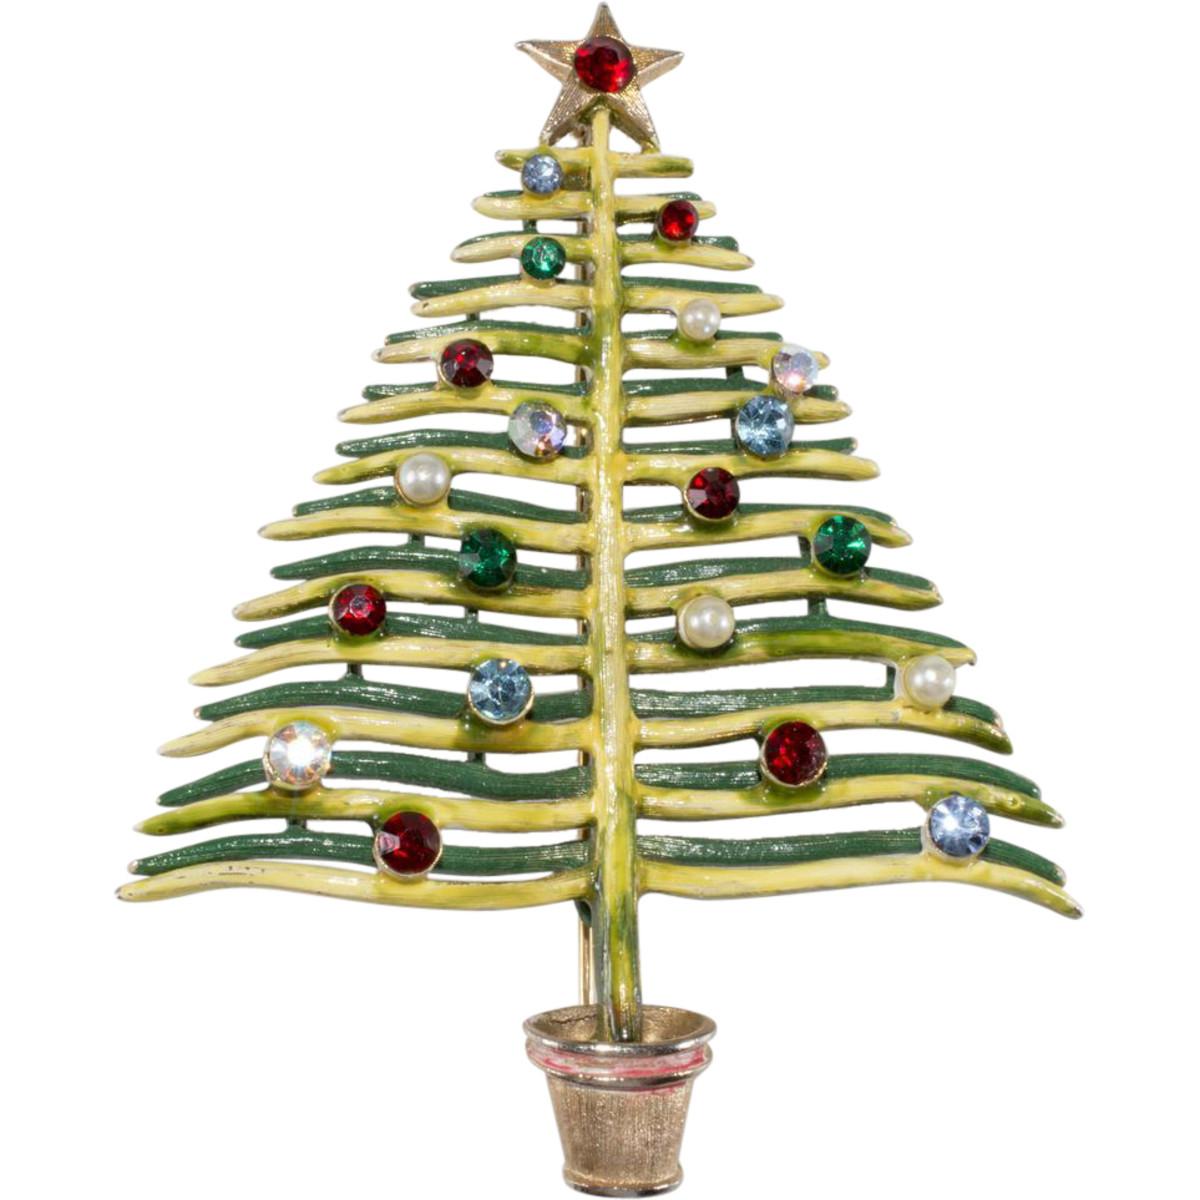 Christmas tree pin, 1960.